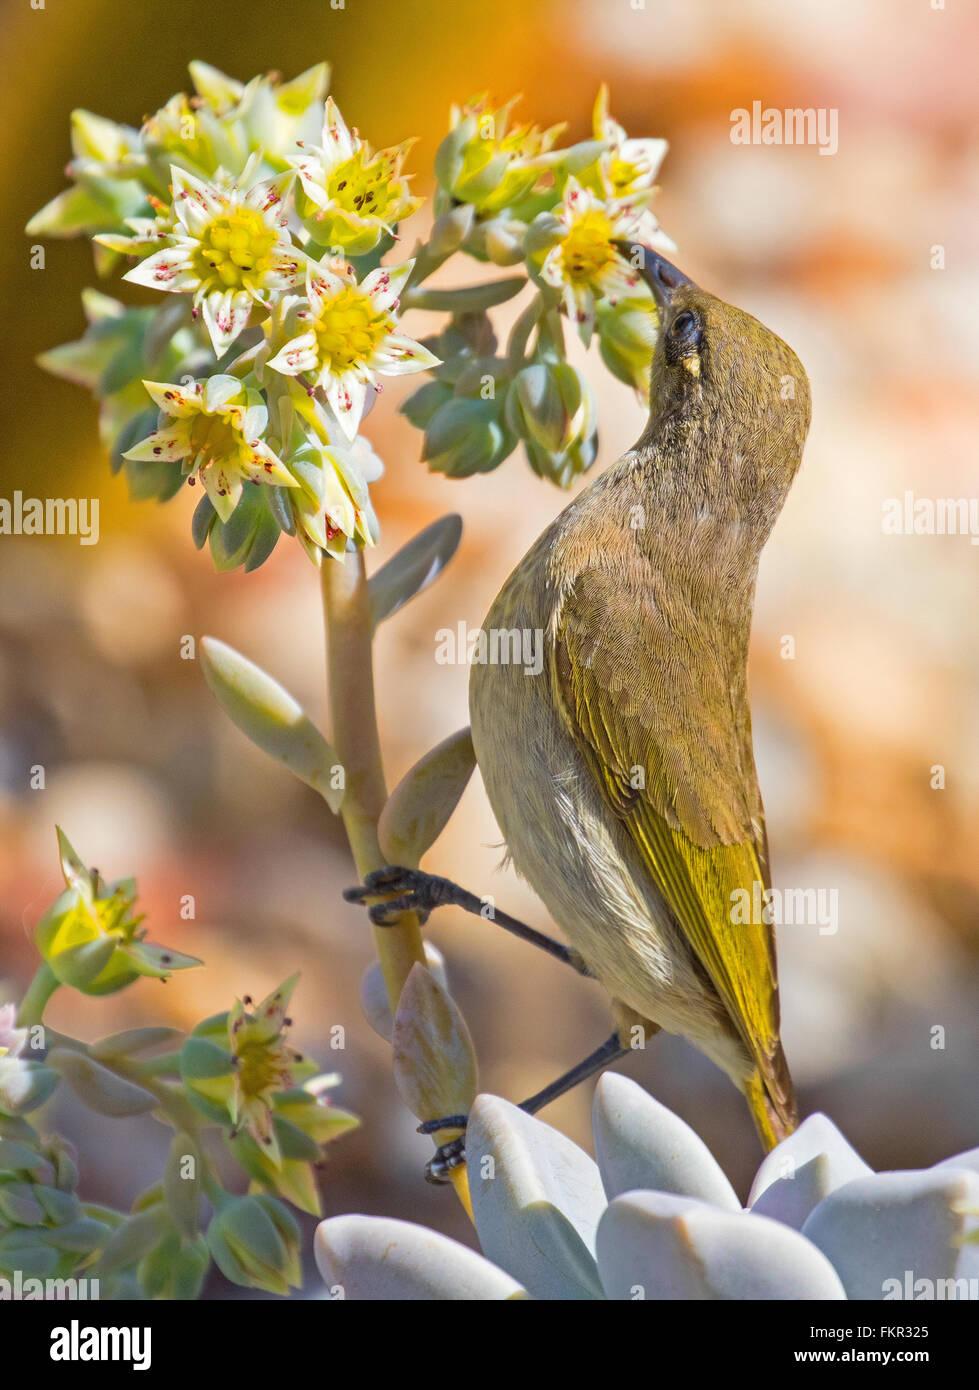 Australian brown honeyeater bird, feeding on nectar from a succulent flower - Stock Image